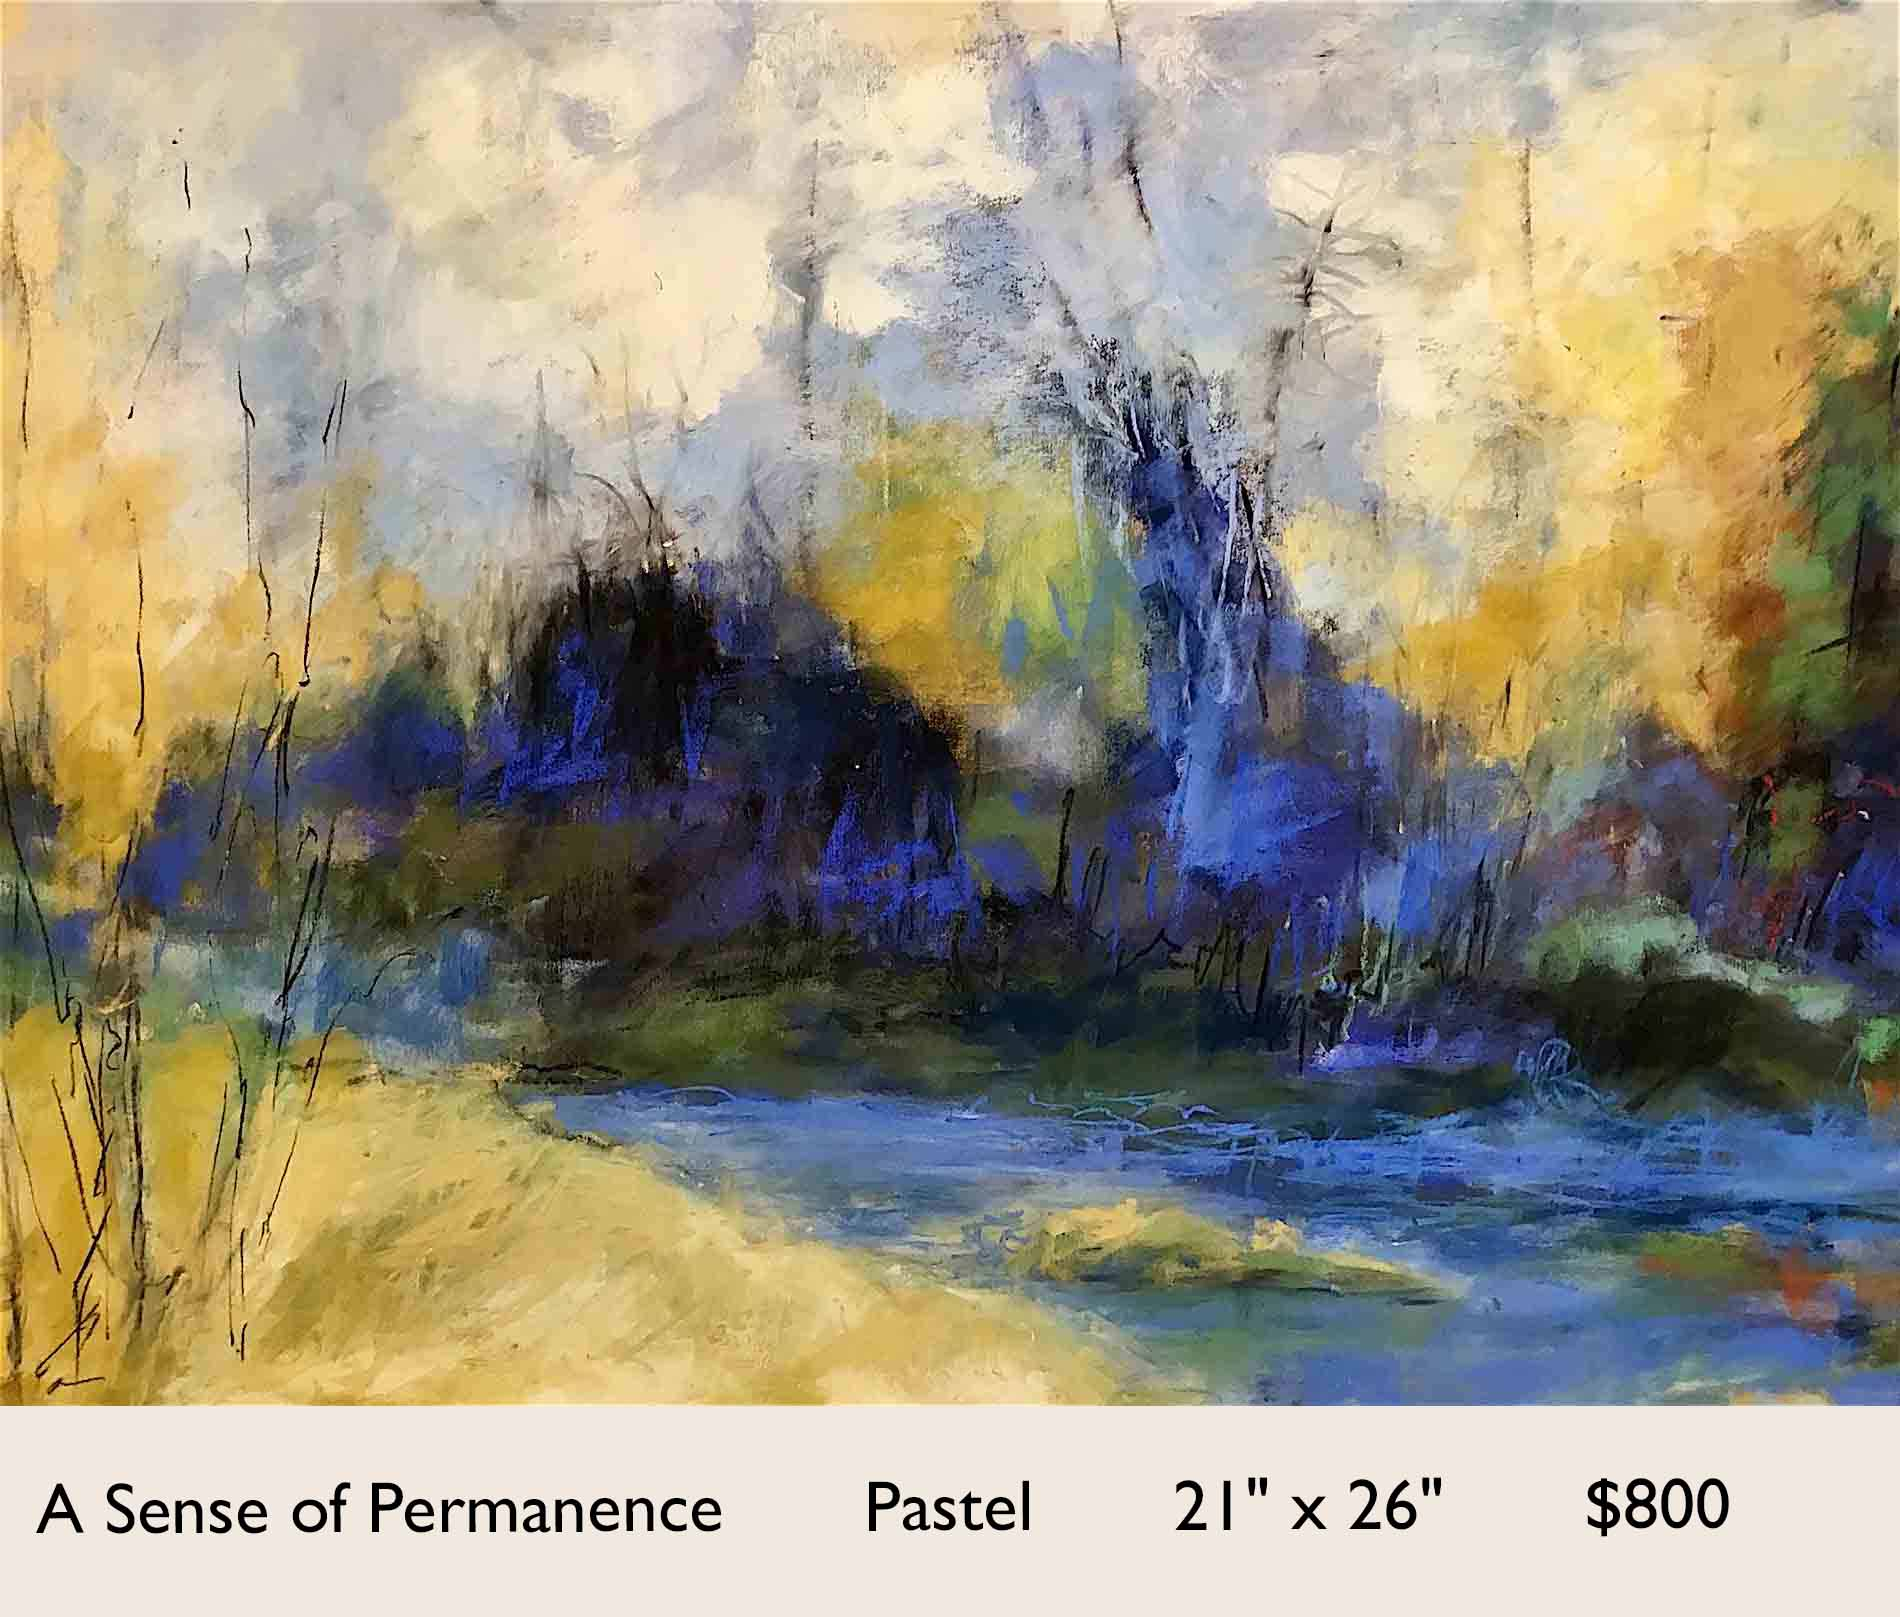 A Sense of Permanence